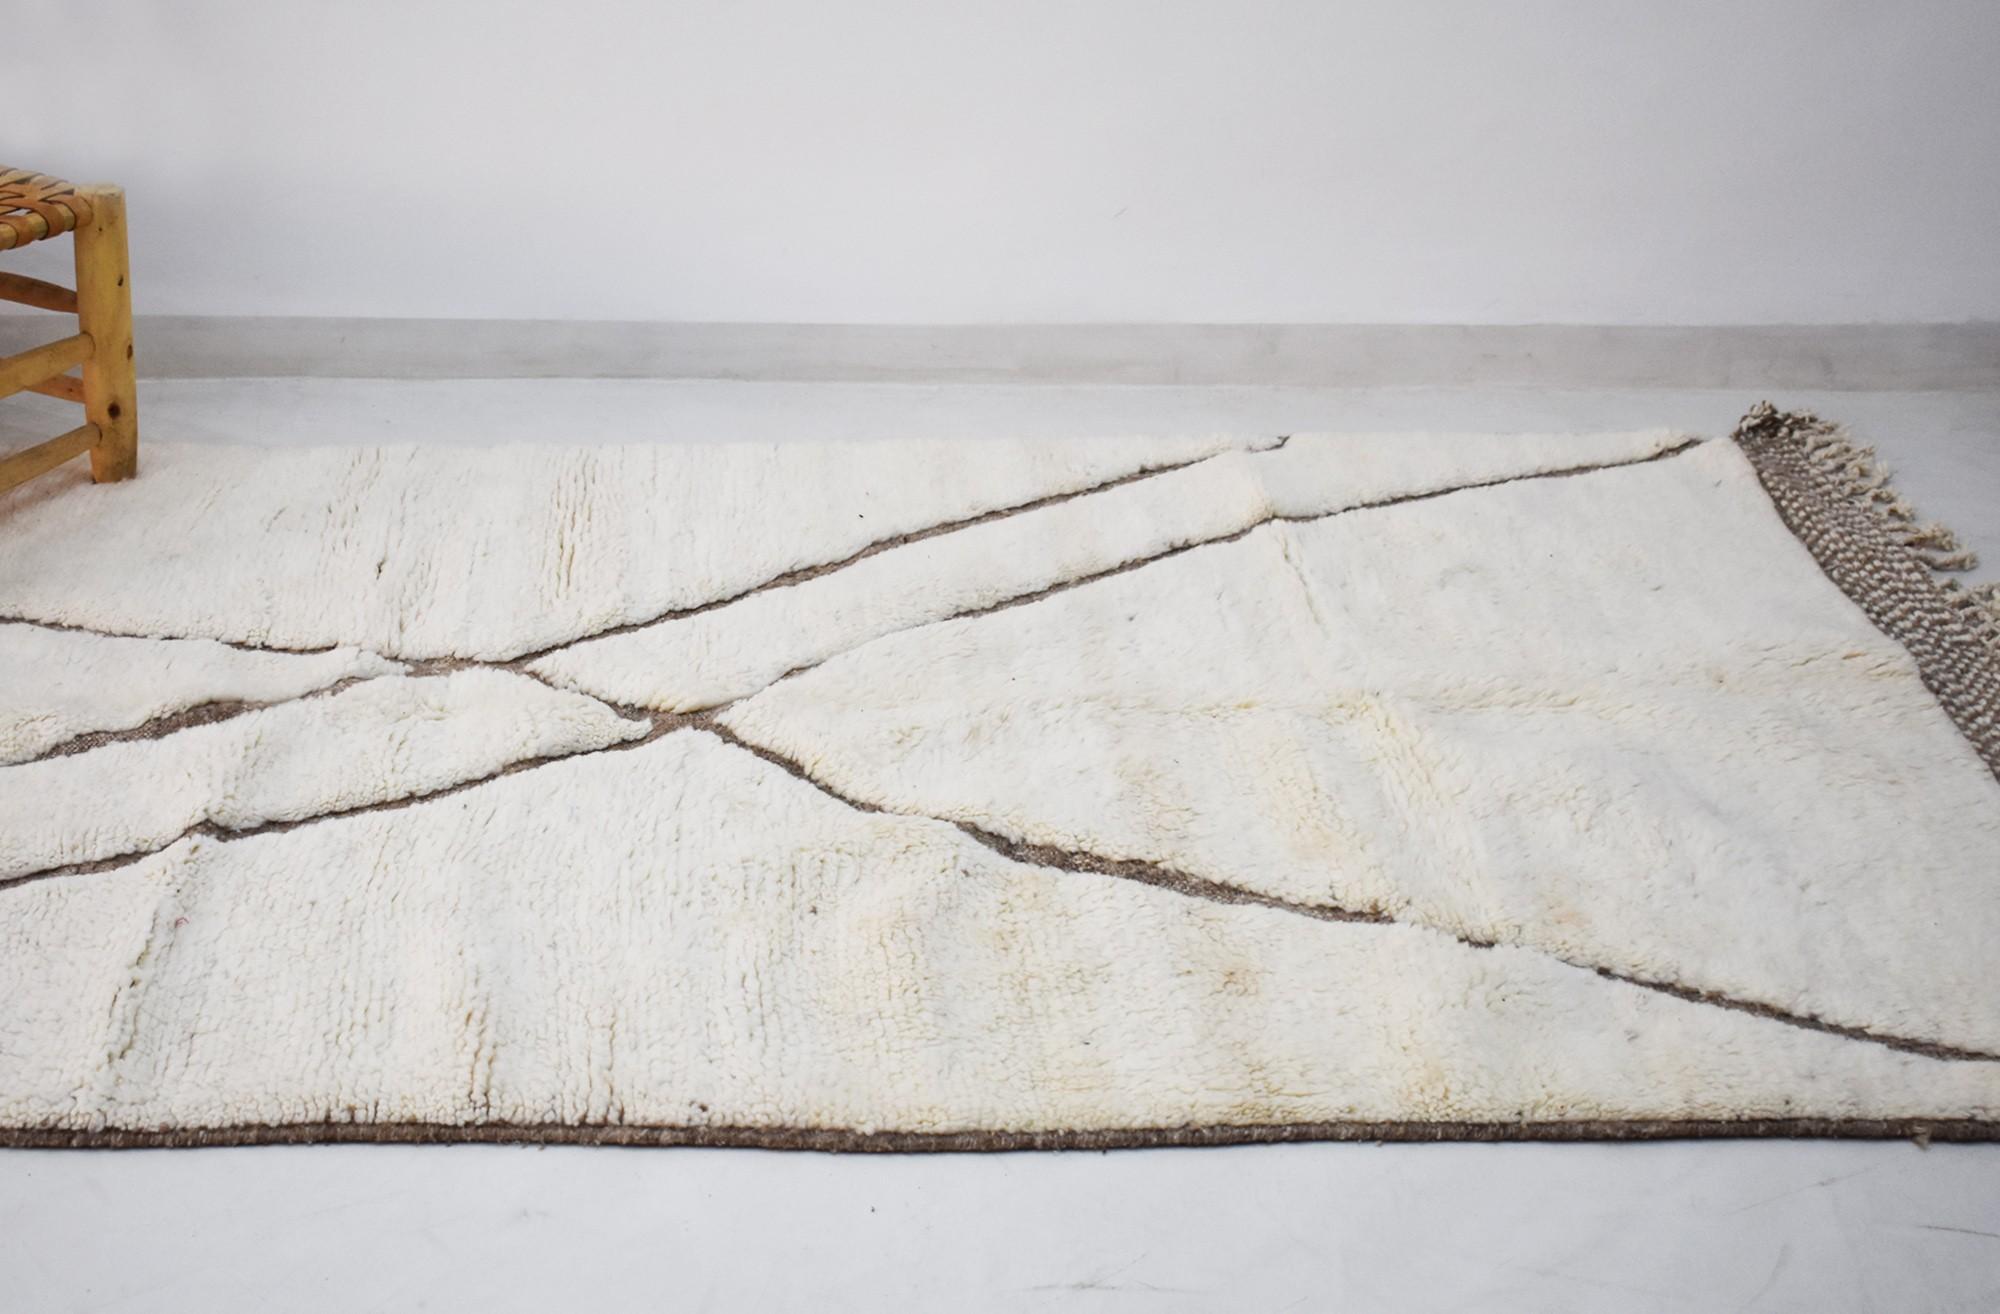 berber carpet long white and black